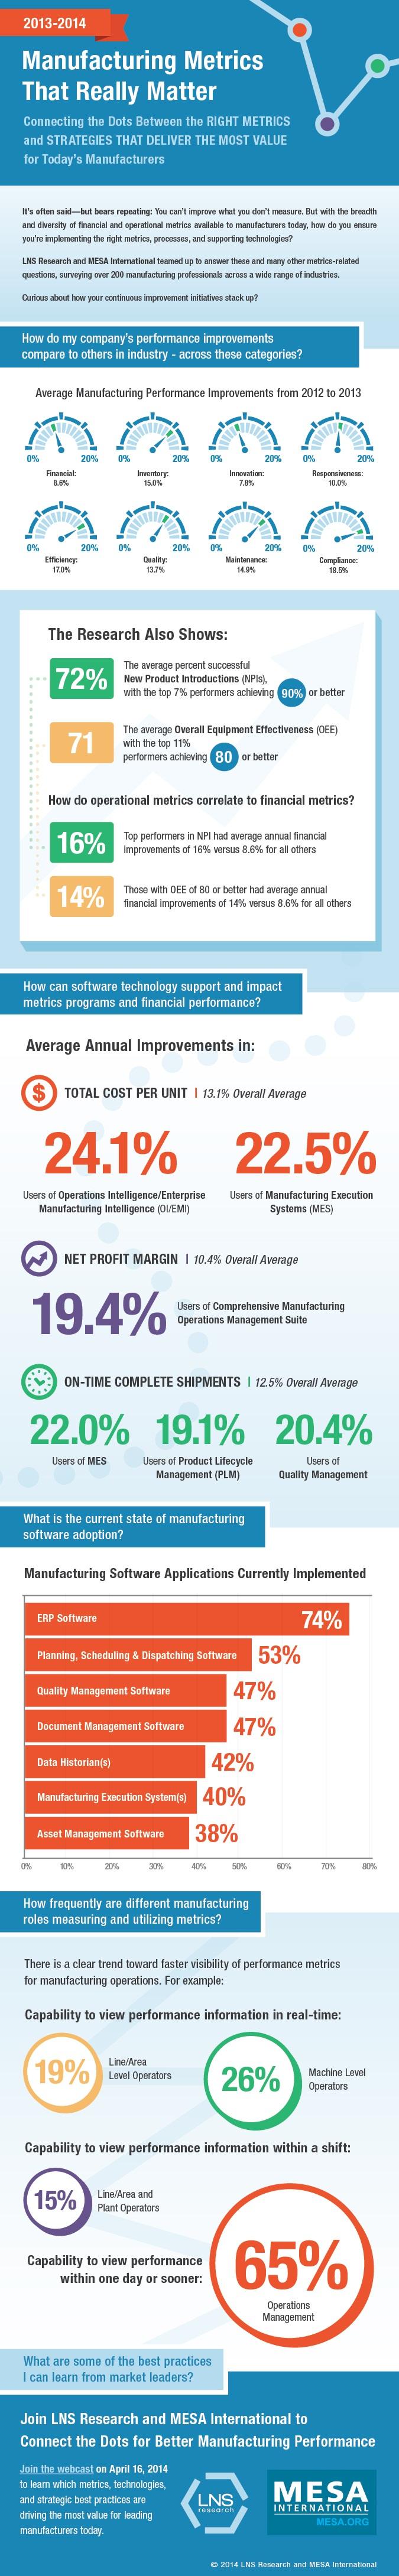 metrics that matter webcast